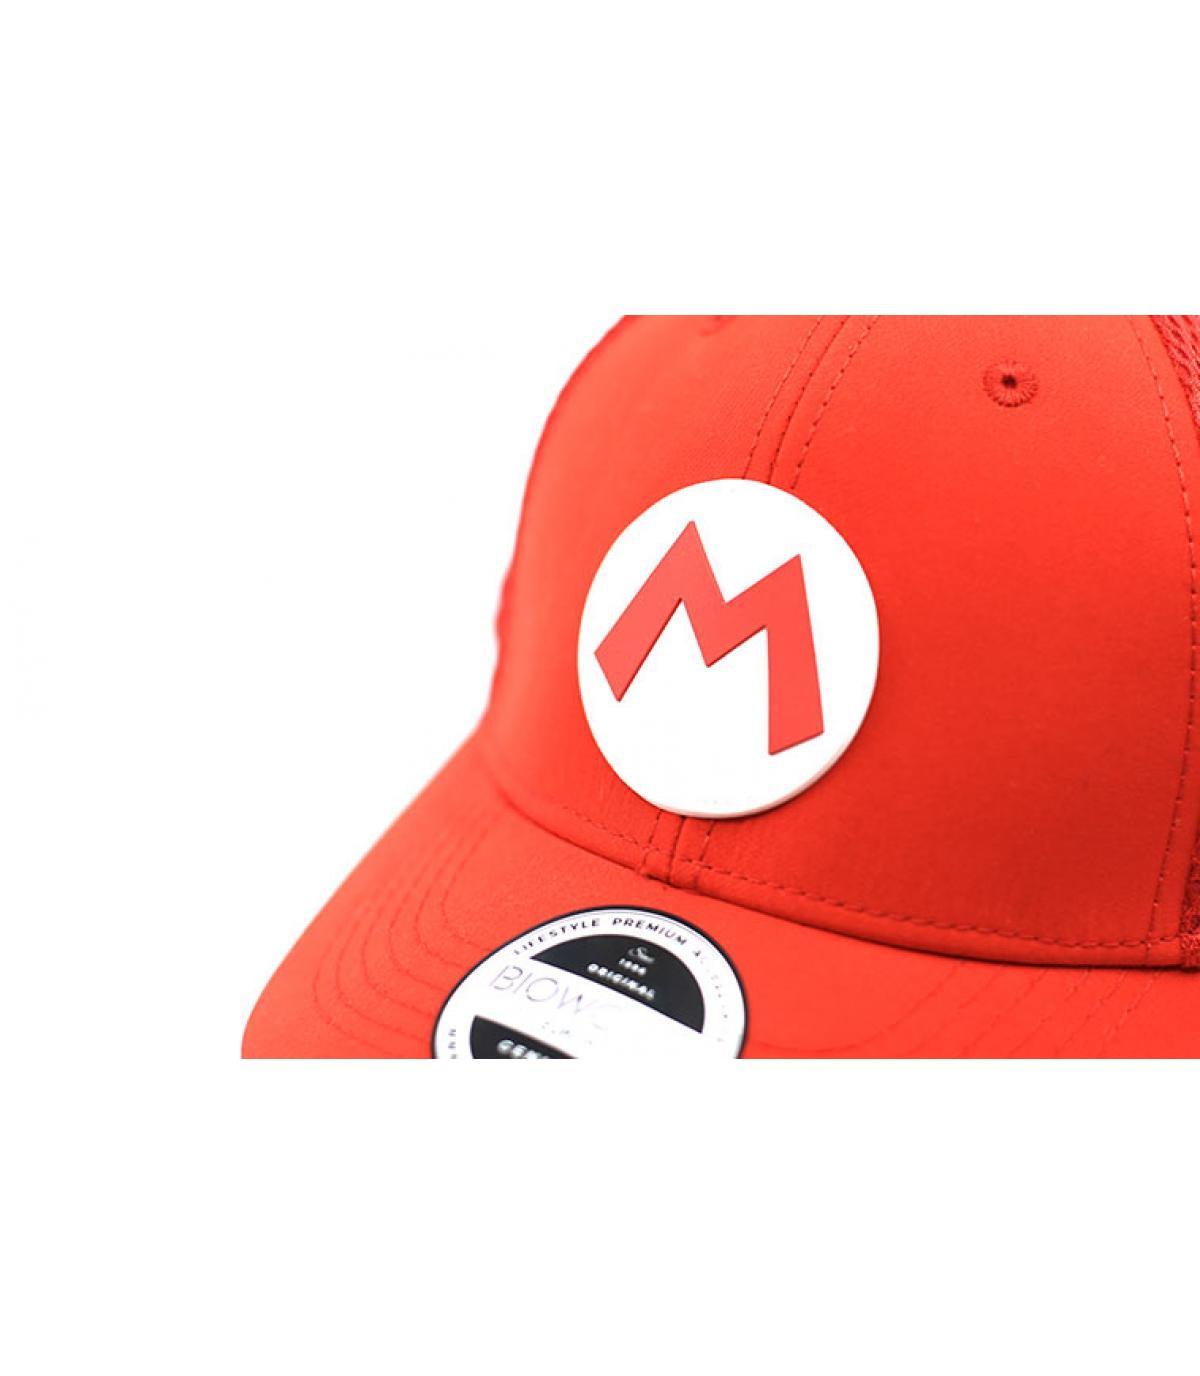 Dettagli Trucker Mario kids - image 3